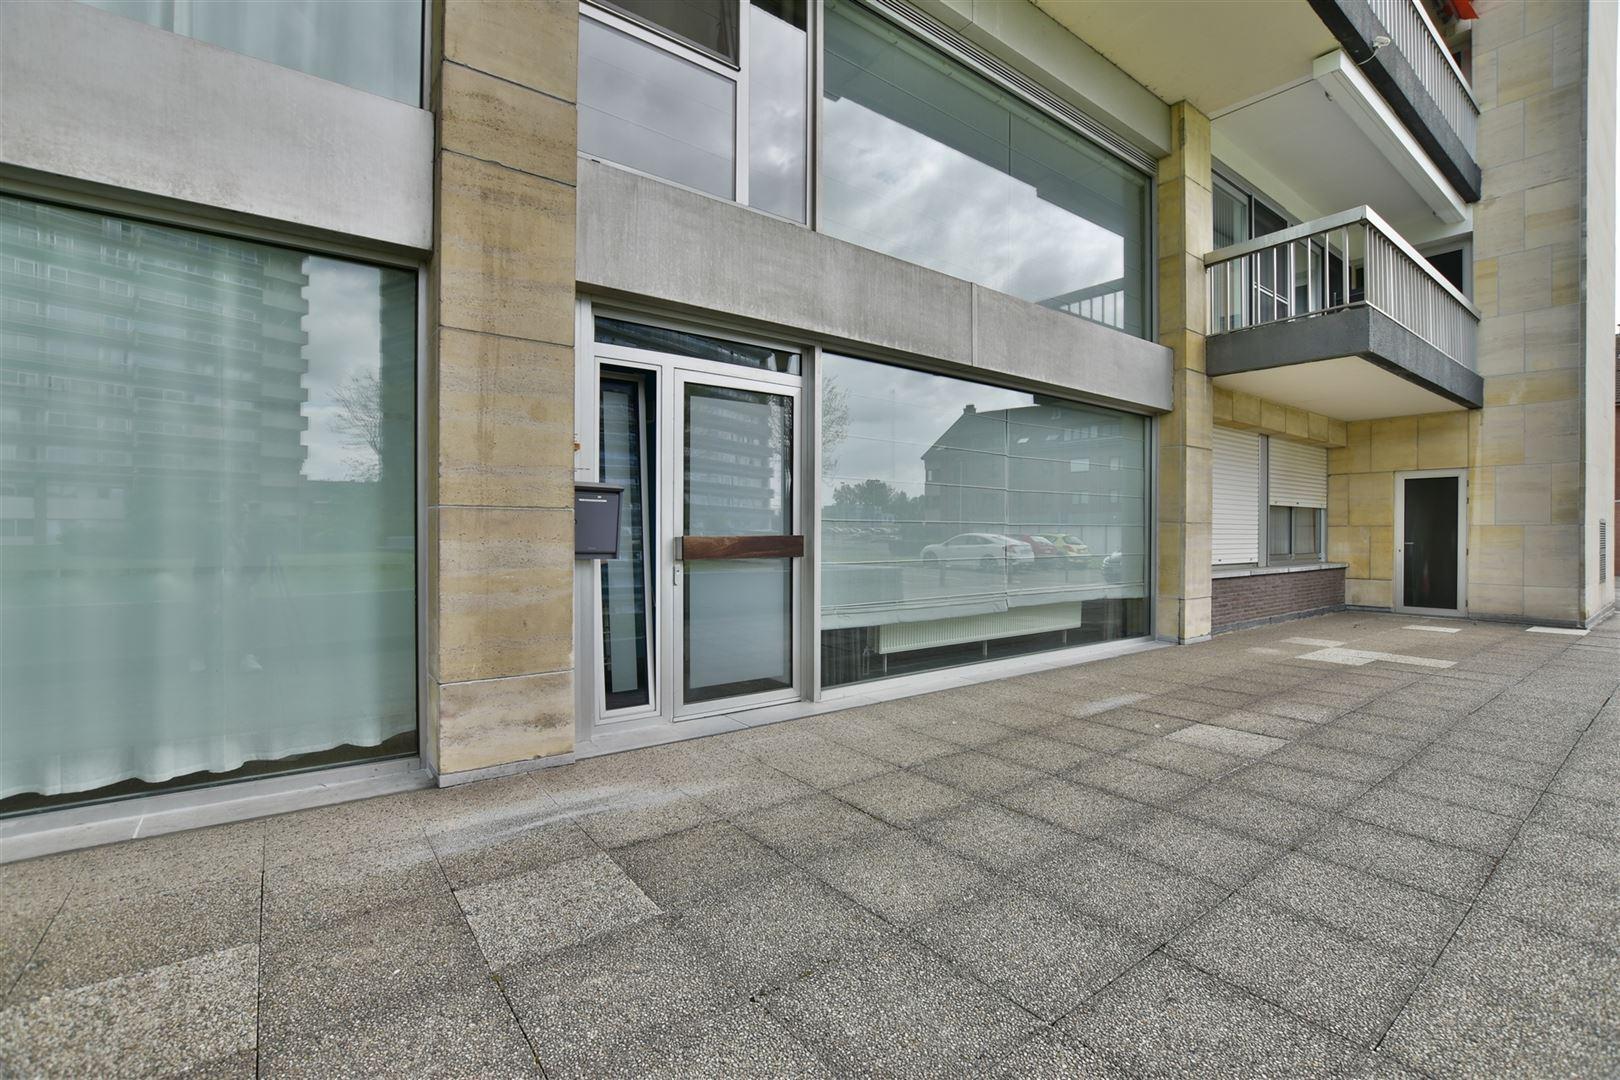 Foto 13 : Appartement te 9200 DENDERMONDE (België) - Prijs € 199.000